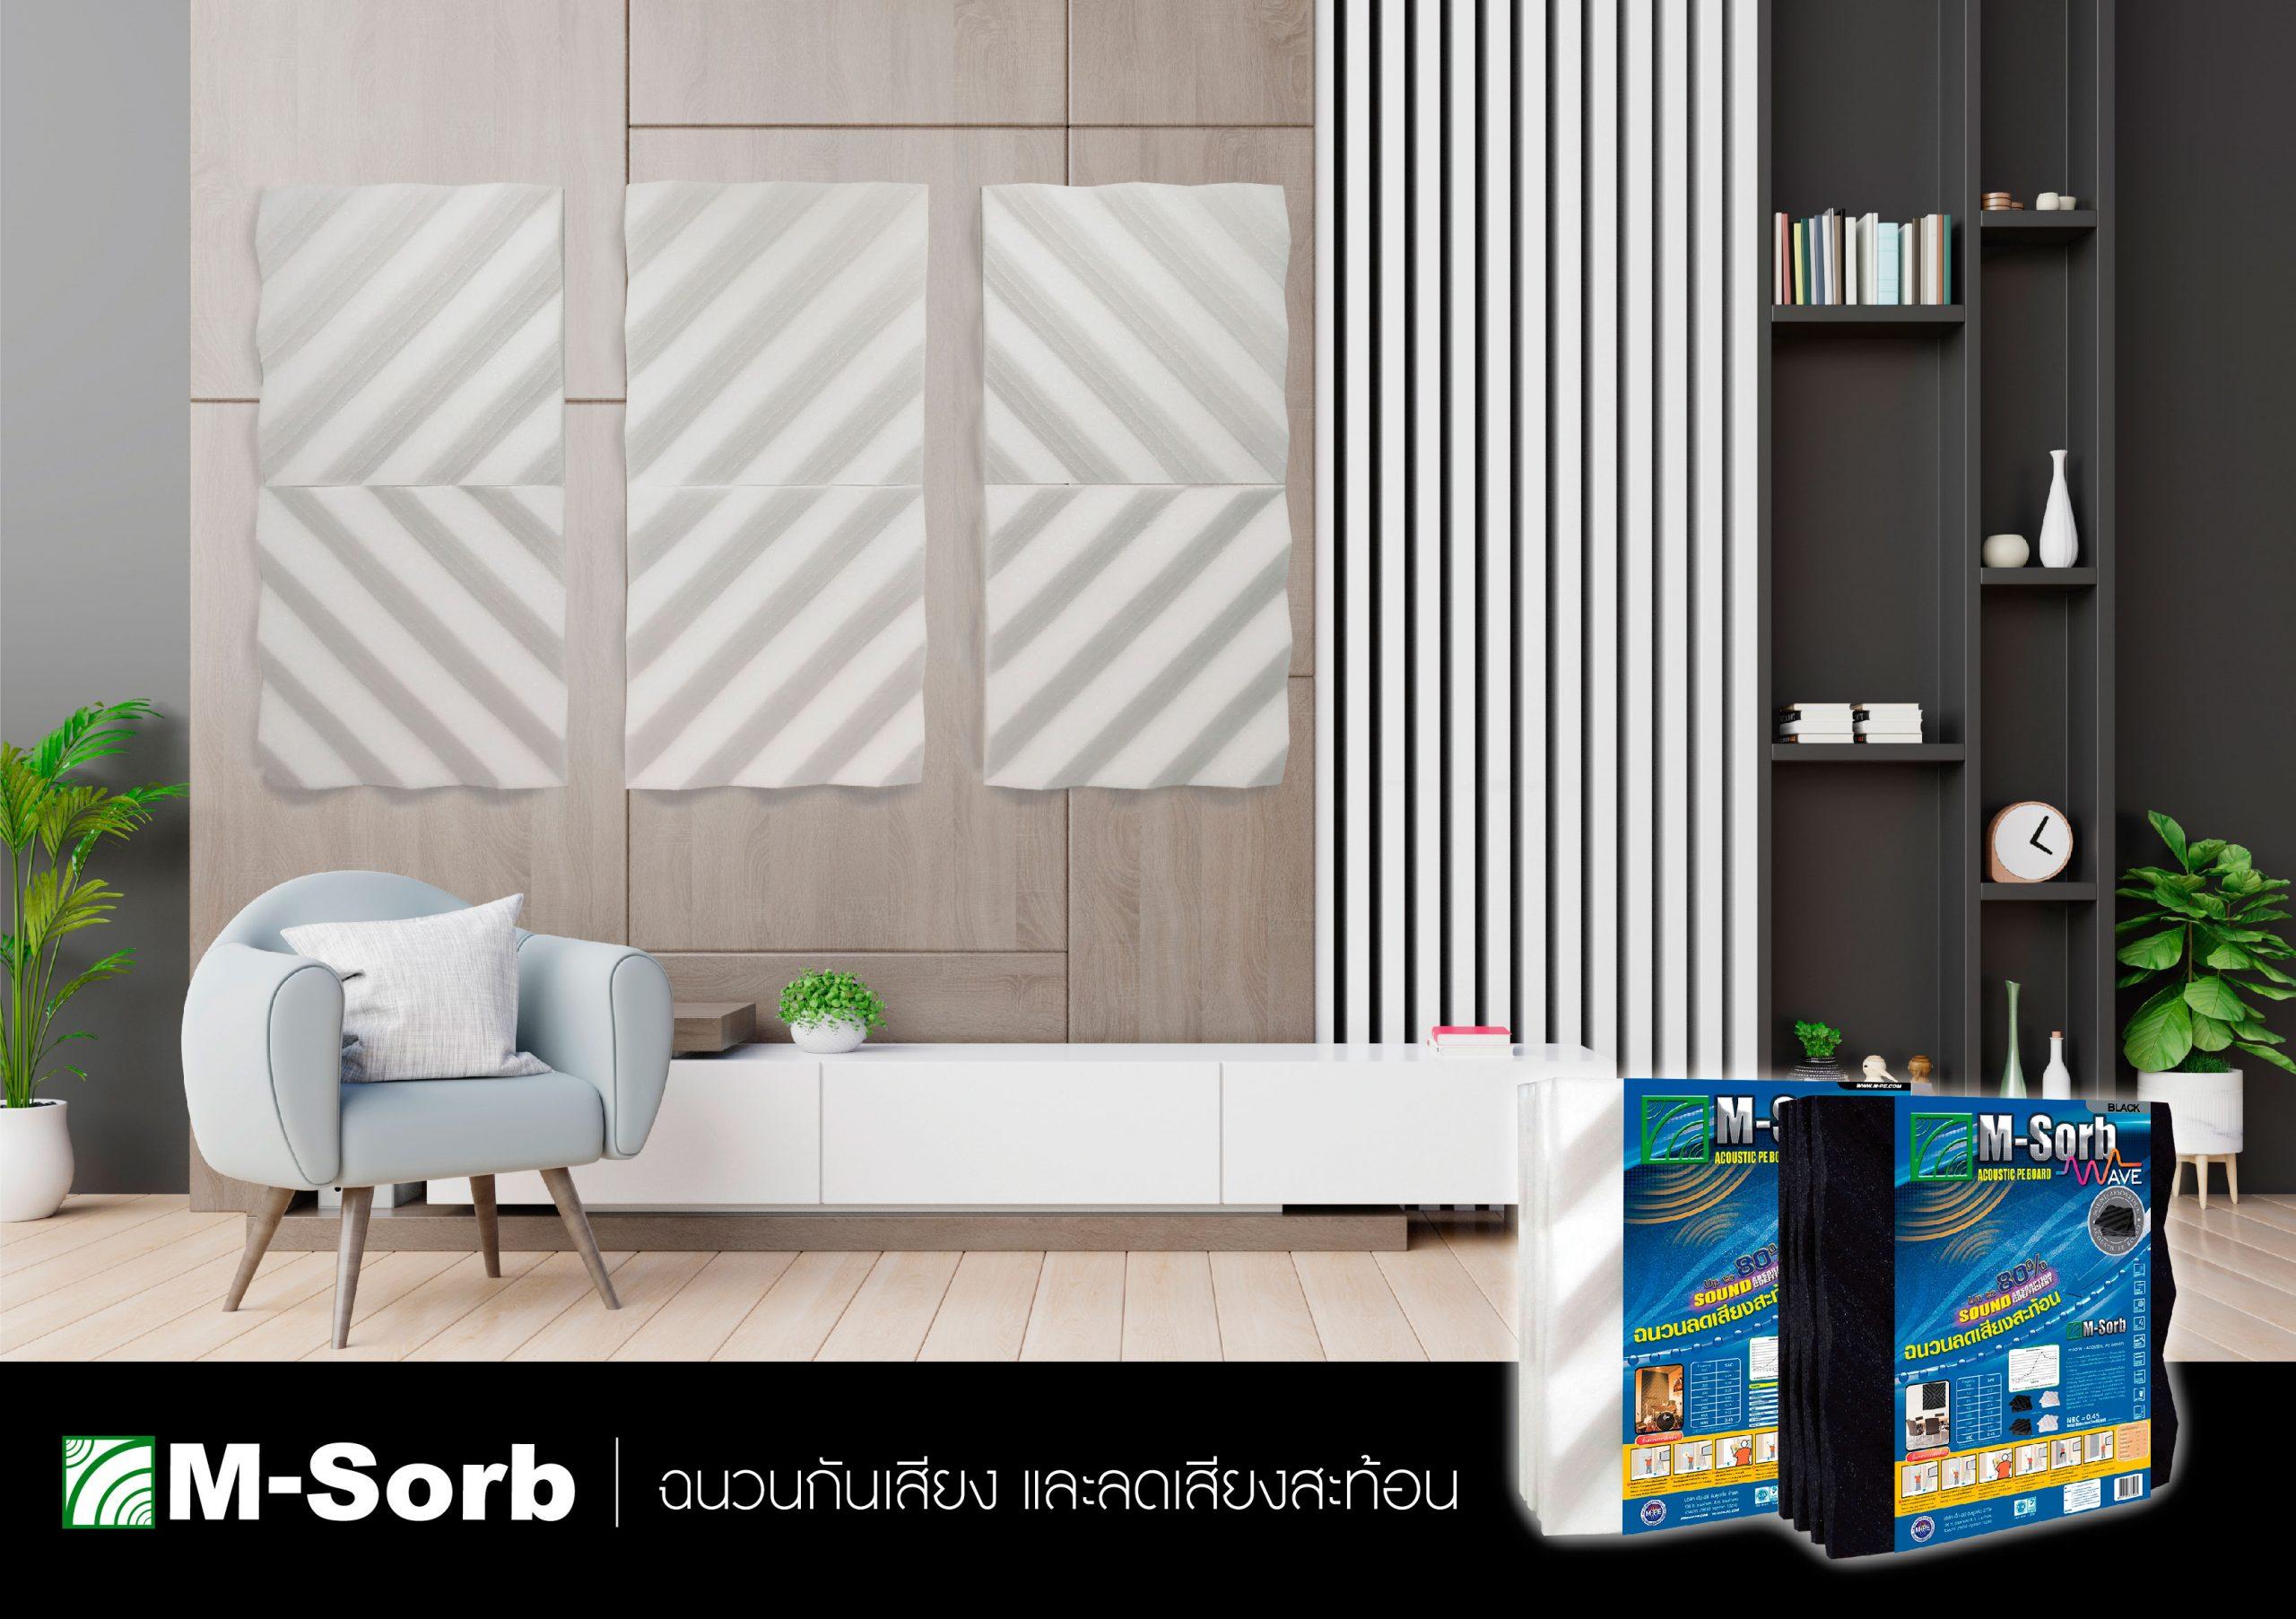 NEW M-SORB